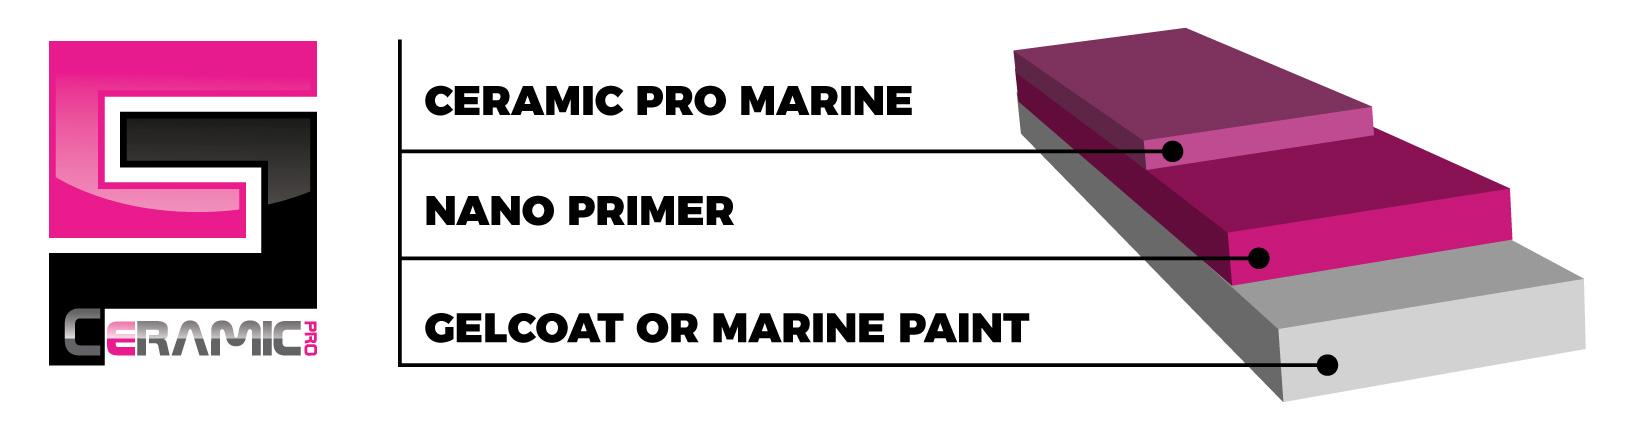 ceramic_pro_marine_system.jpg